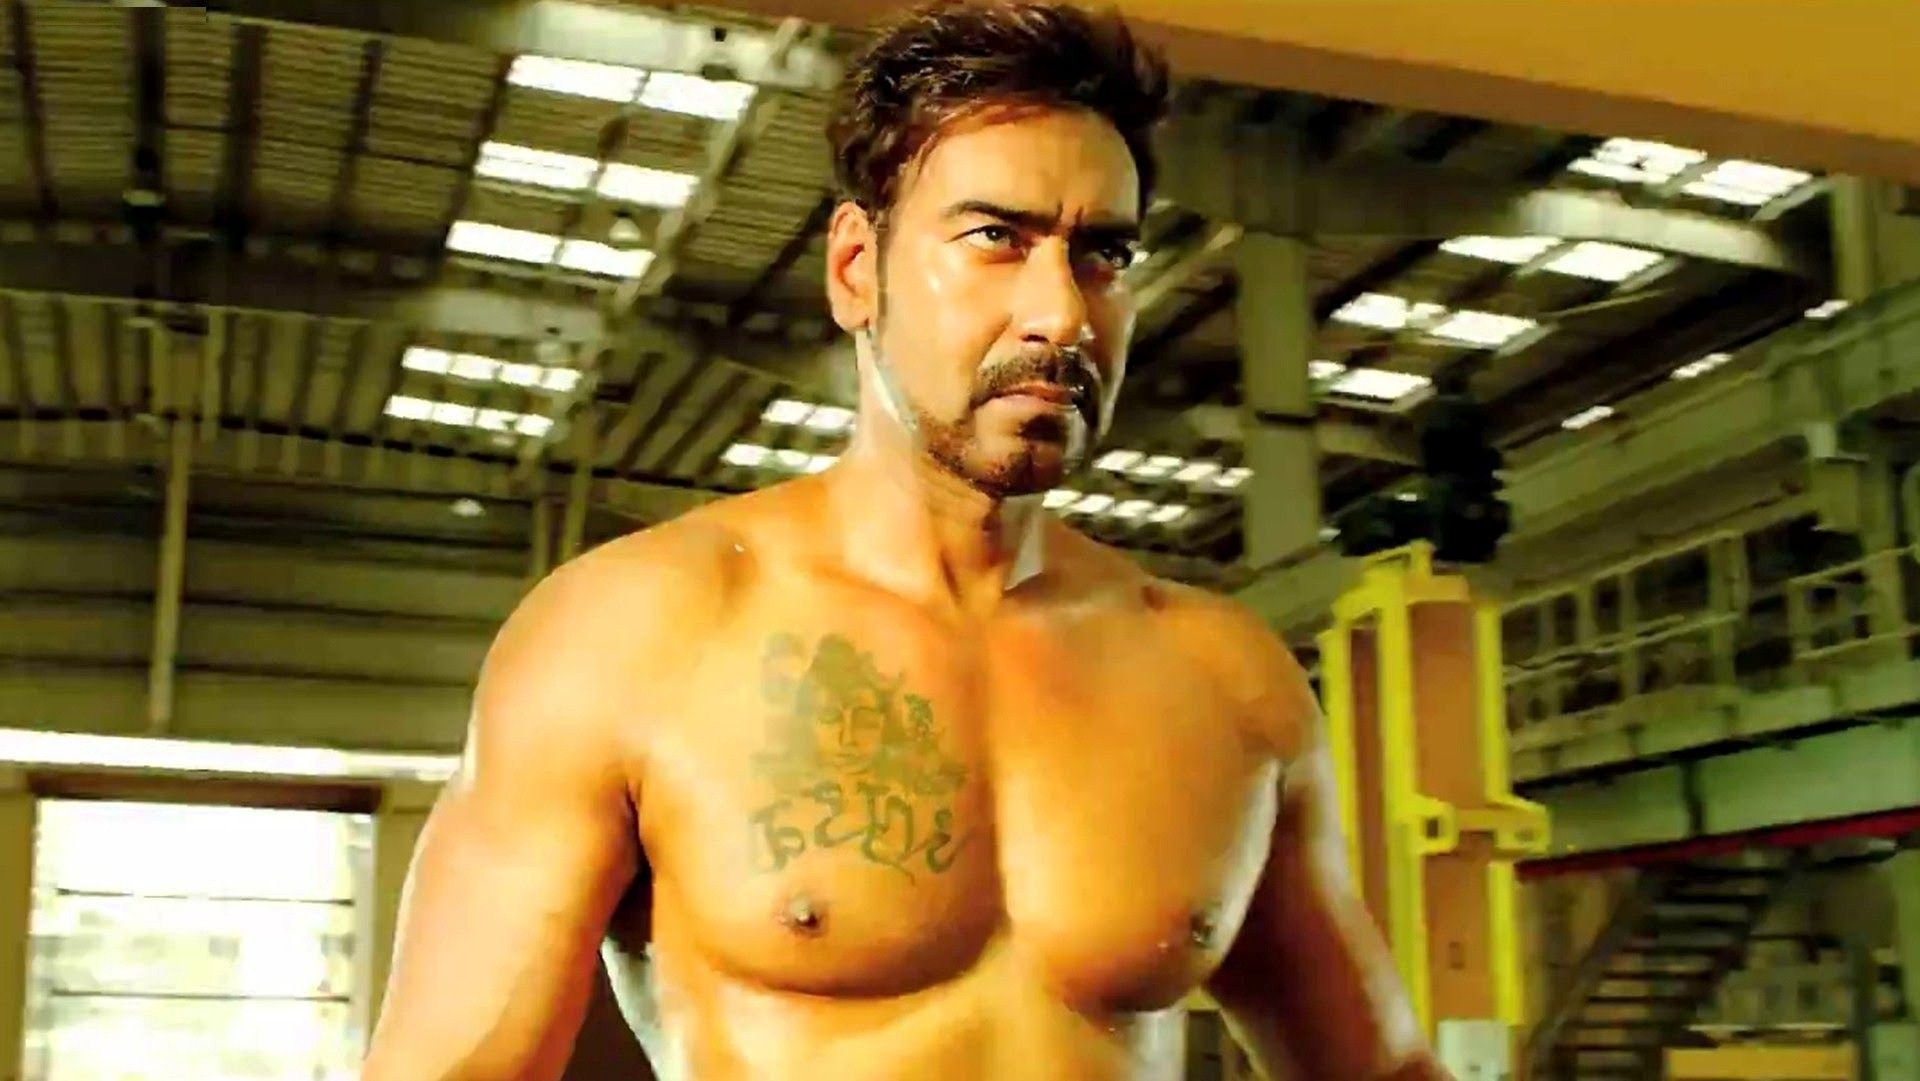 Bollywood actor ajay devgan without shirt photo ajay devgandevgn bollywood actor ajay devgan without shirt photo altavistaventures Image collections